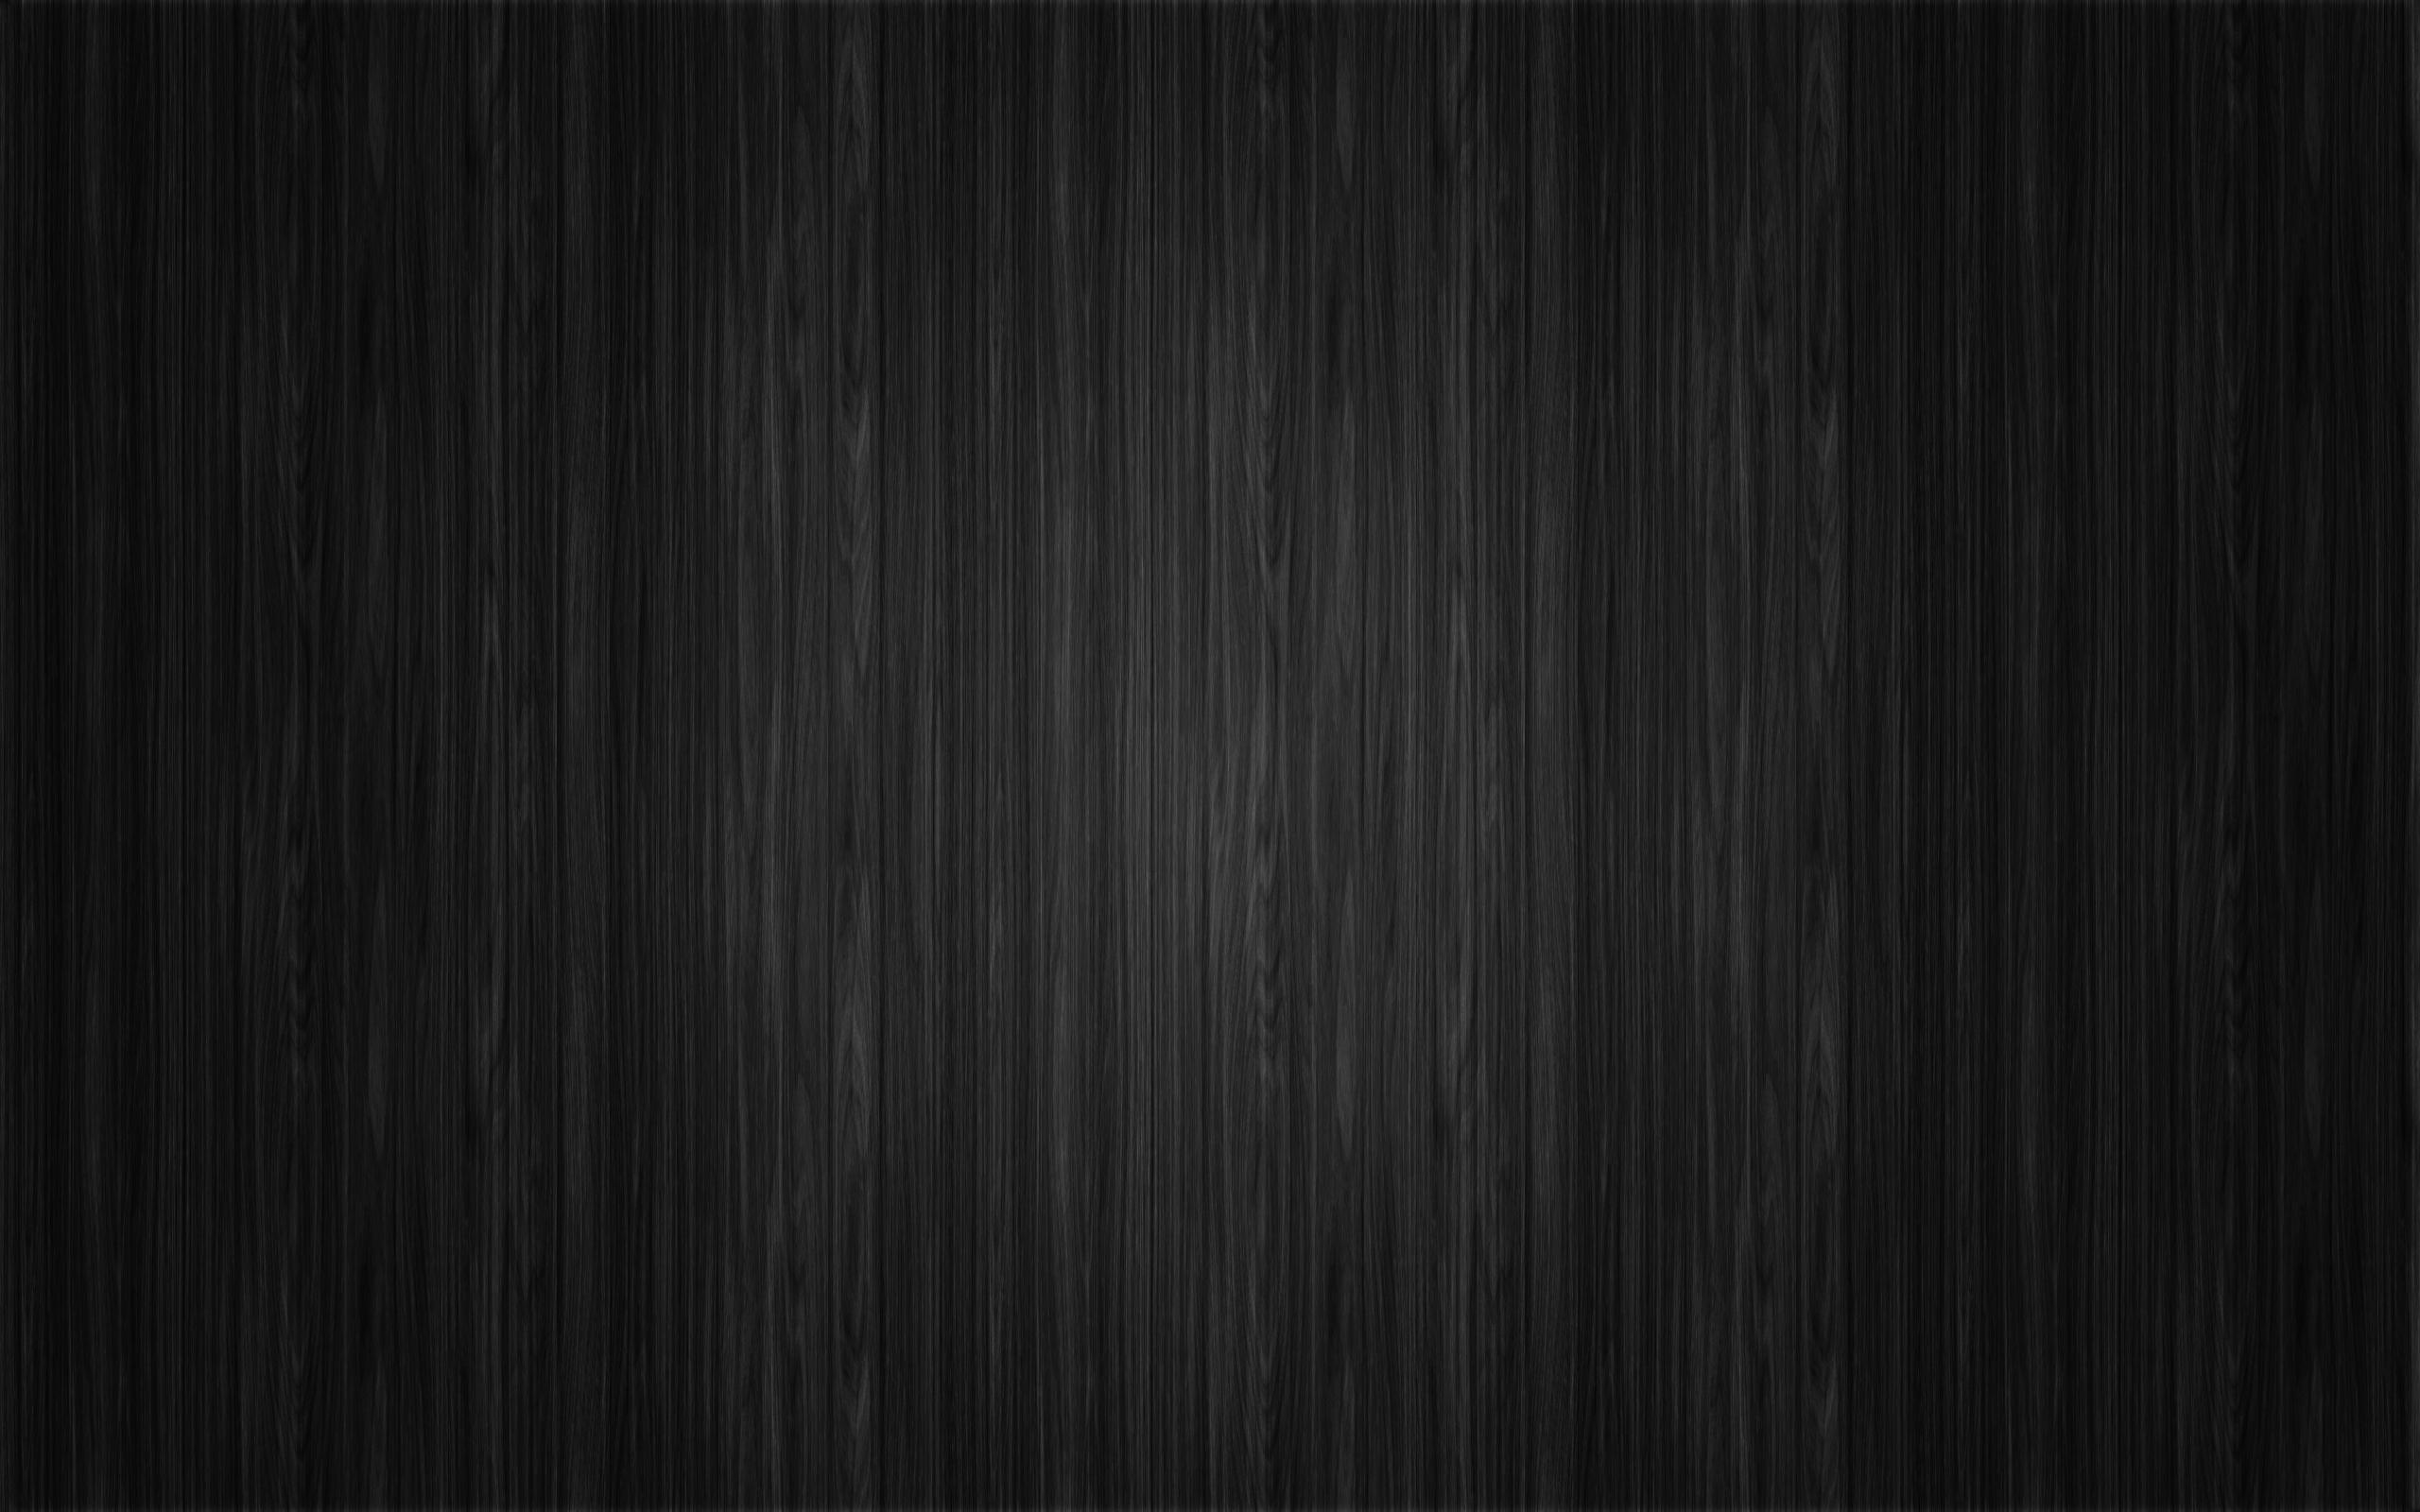 black hd wallpapers | Backgrounds | Pinterest | Color black, Black